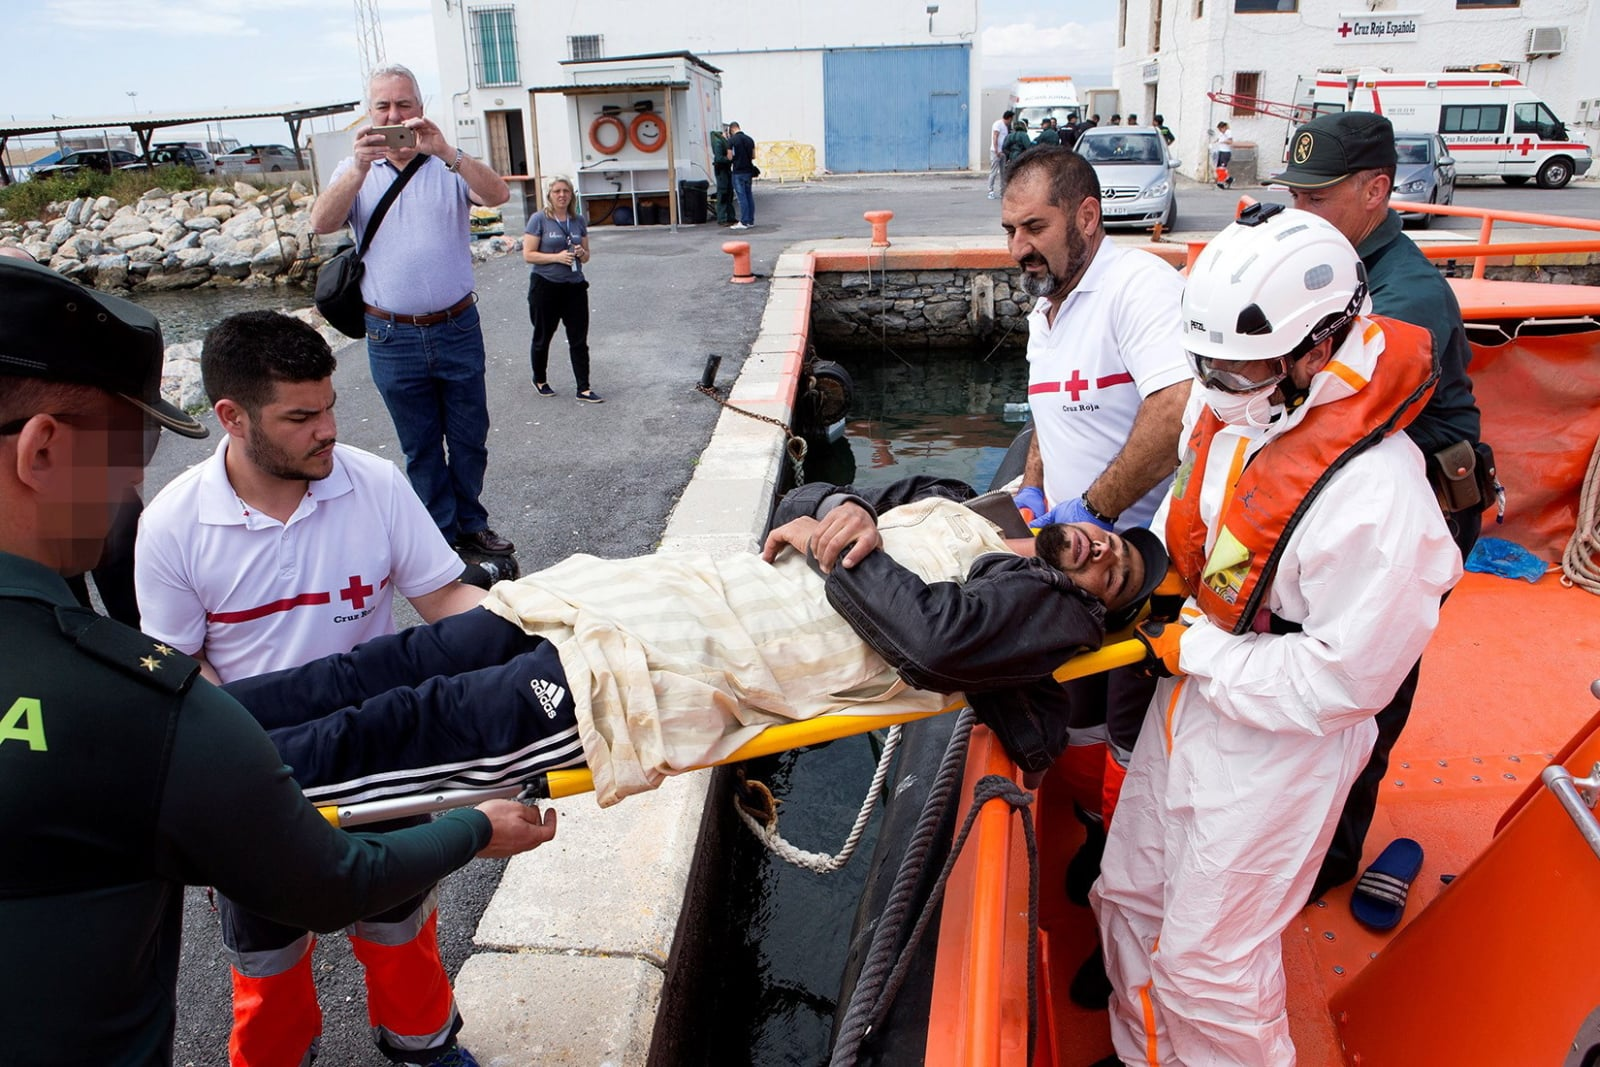 Migranci w Hiszpanii fot. EPA/MIGUEL PAQUET